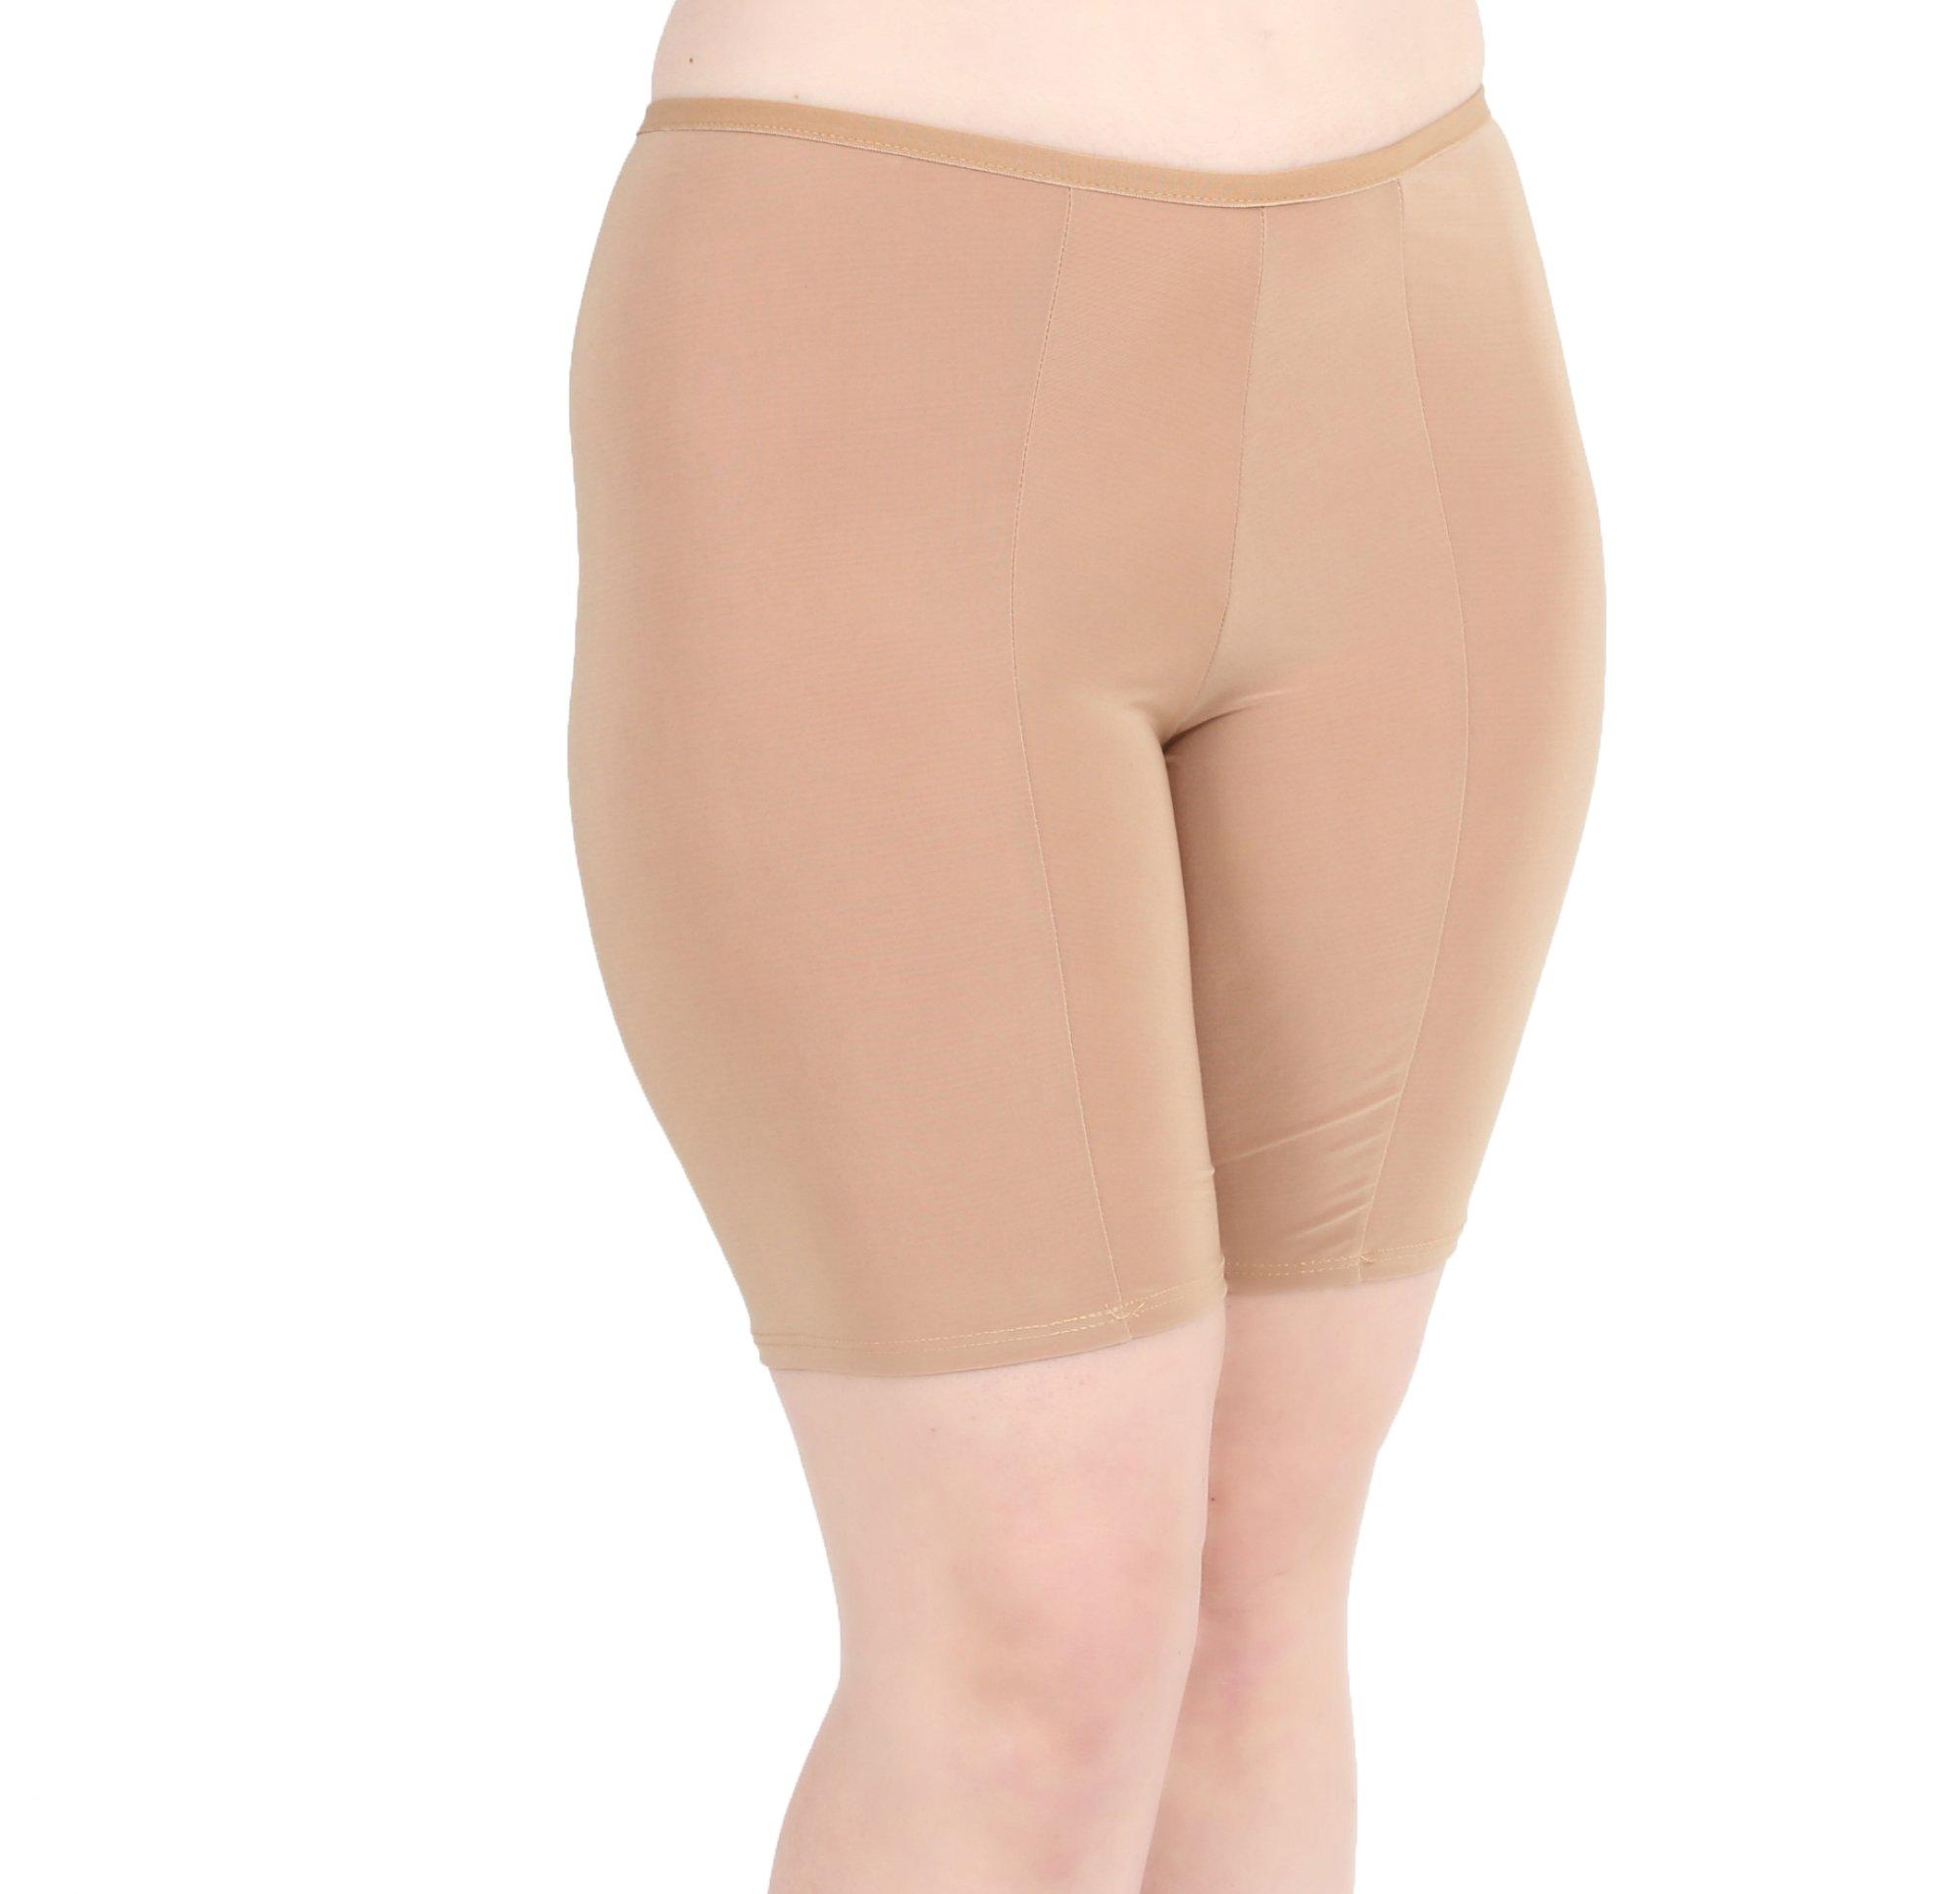 Undersummers Classic Shortlette: Rash Guard Slip Shorts (Medium, Beige)